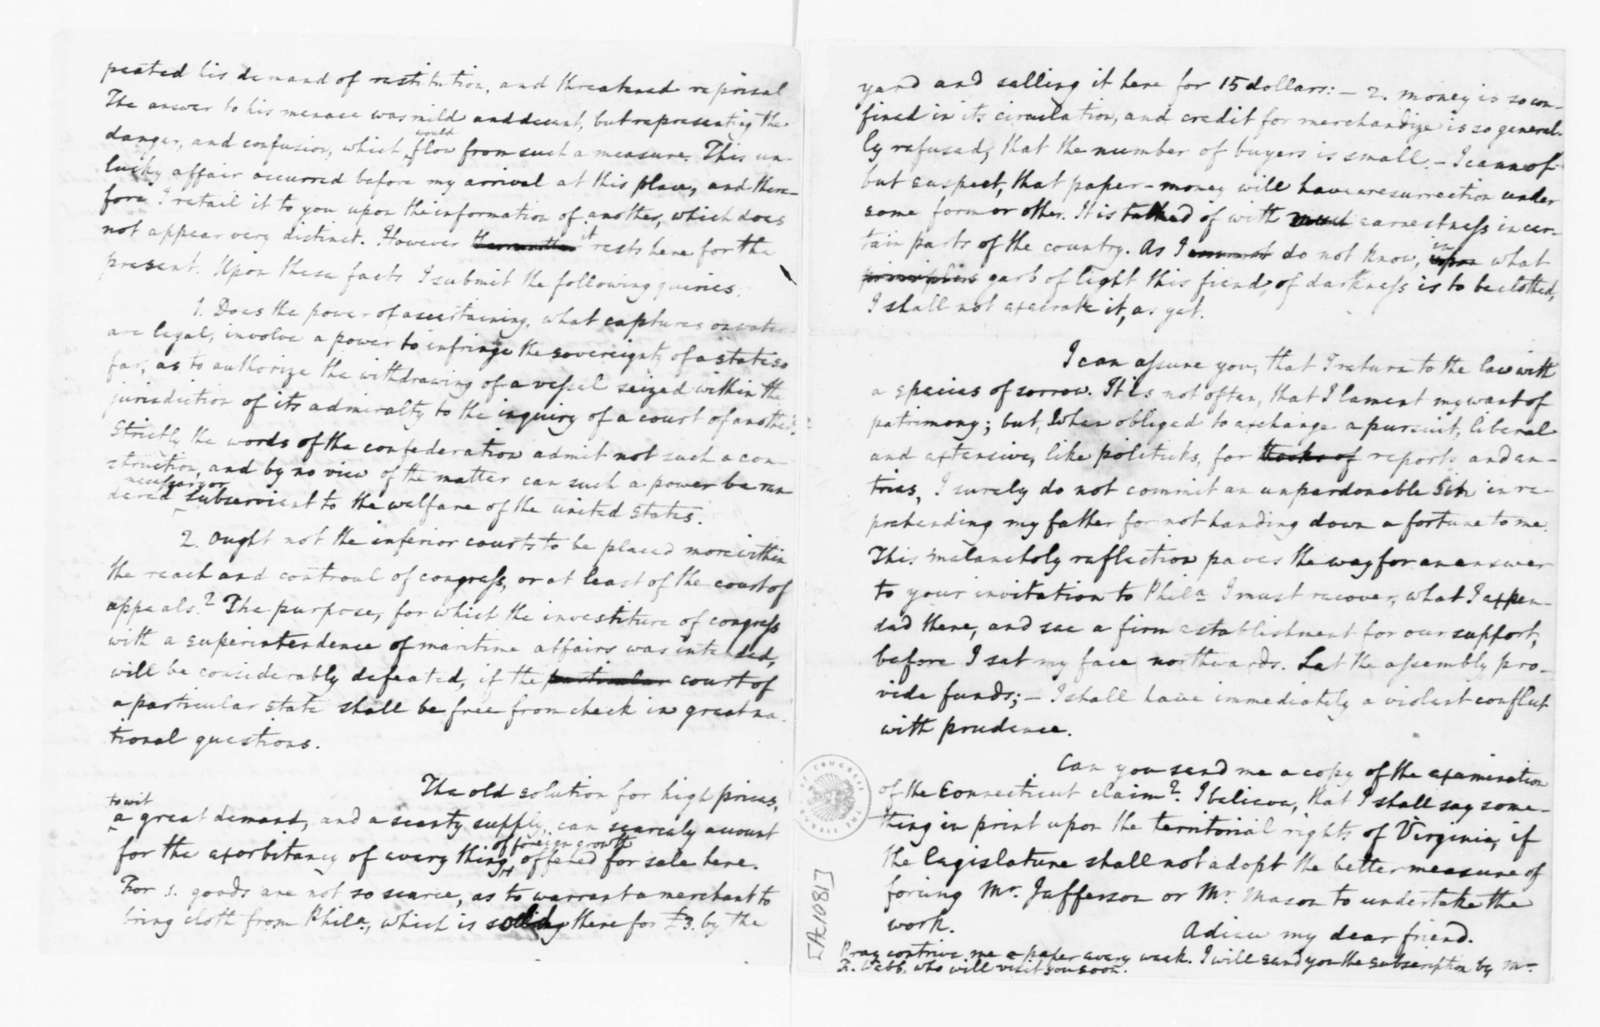 Edmund Randolph to James Madison, April 19, 1782.